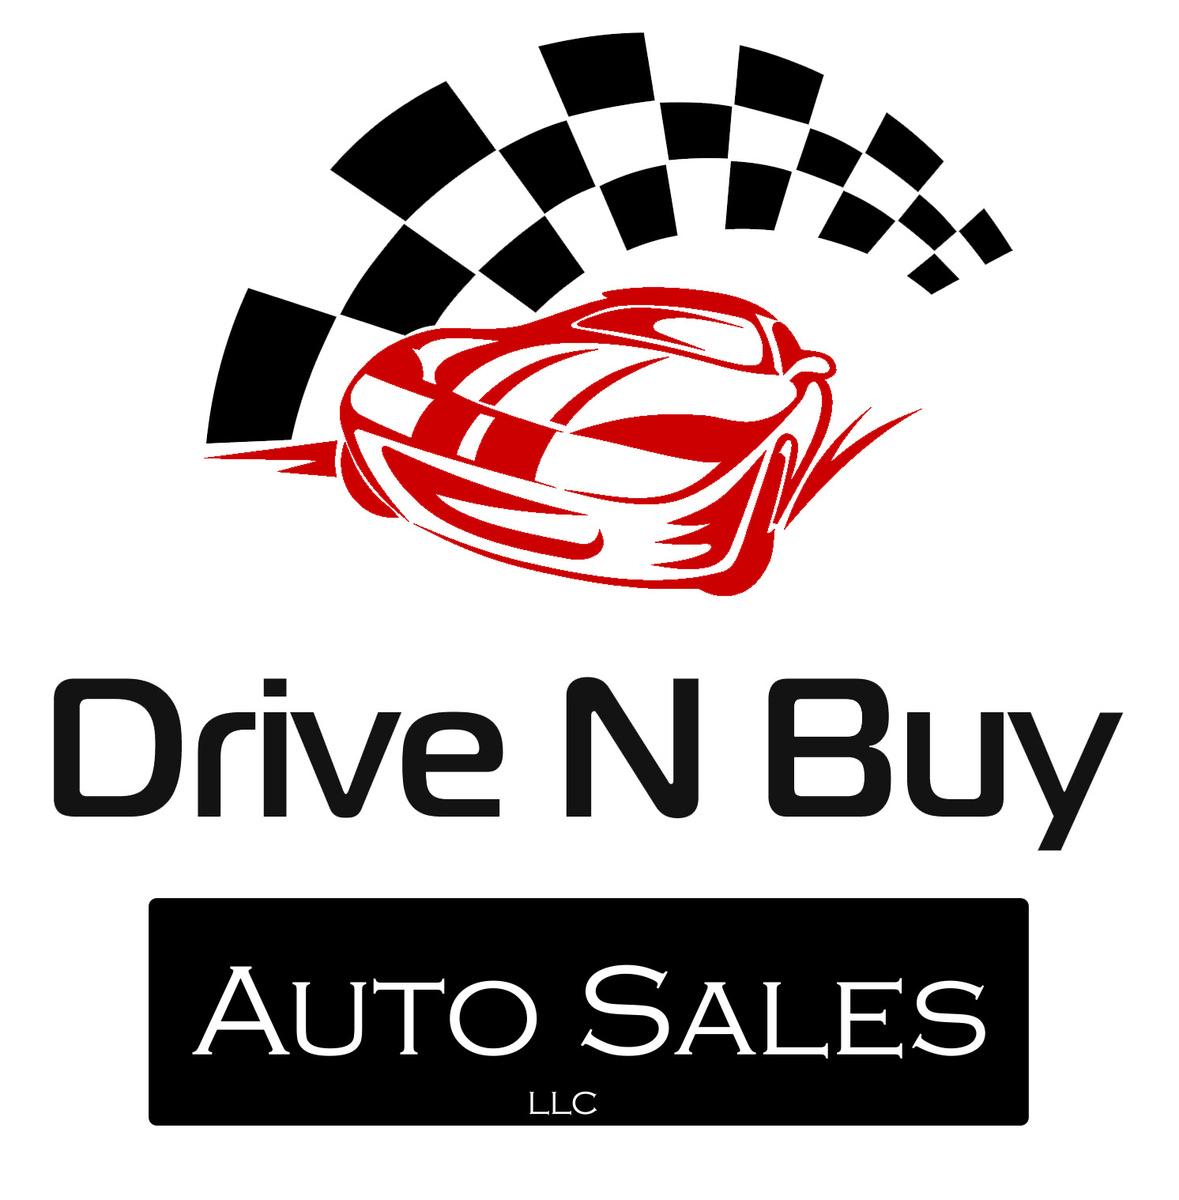 Carmax Rock Hill Sc >> N N Auto Sales Used Cars New Cars Reviews Photos | Upcomingcarshq.com